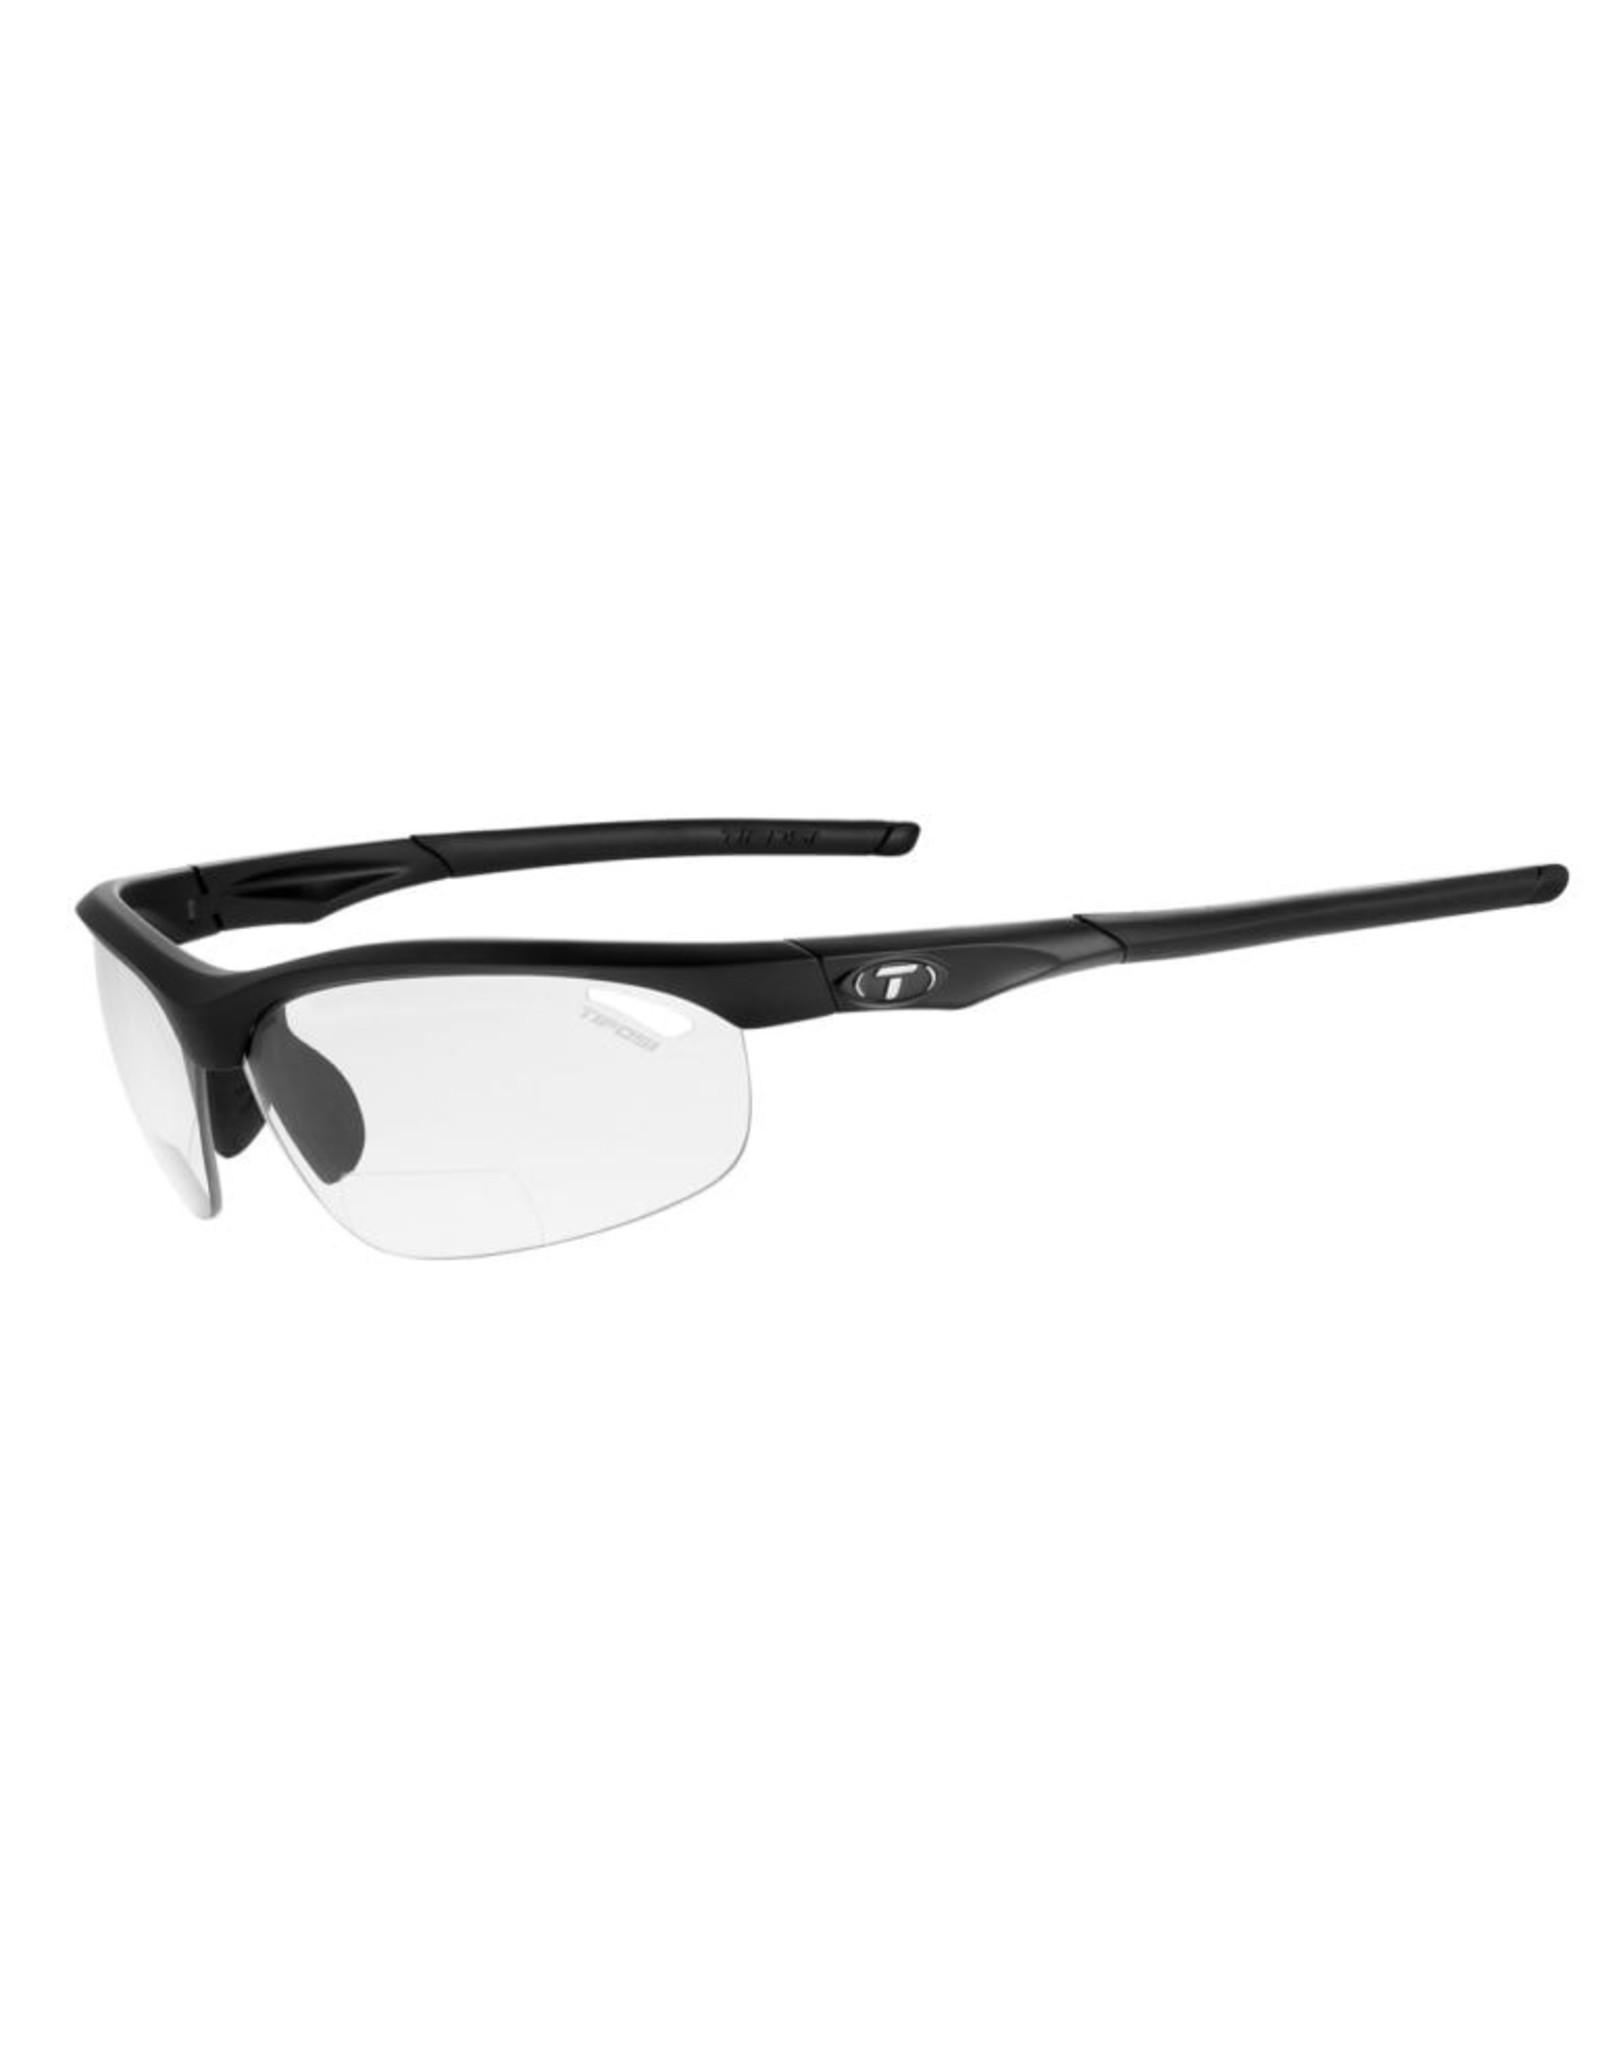 Tifosi Optics Veloce, Matte Black Foto +2.0 Reader Lens Sunglasses - Light Night Fototec +2.0